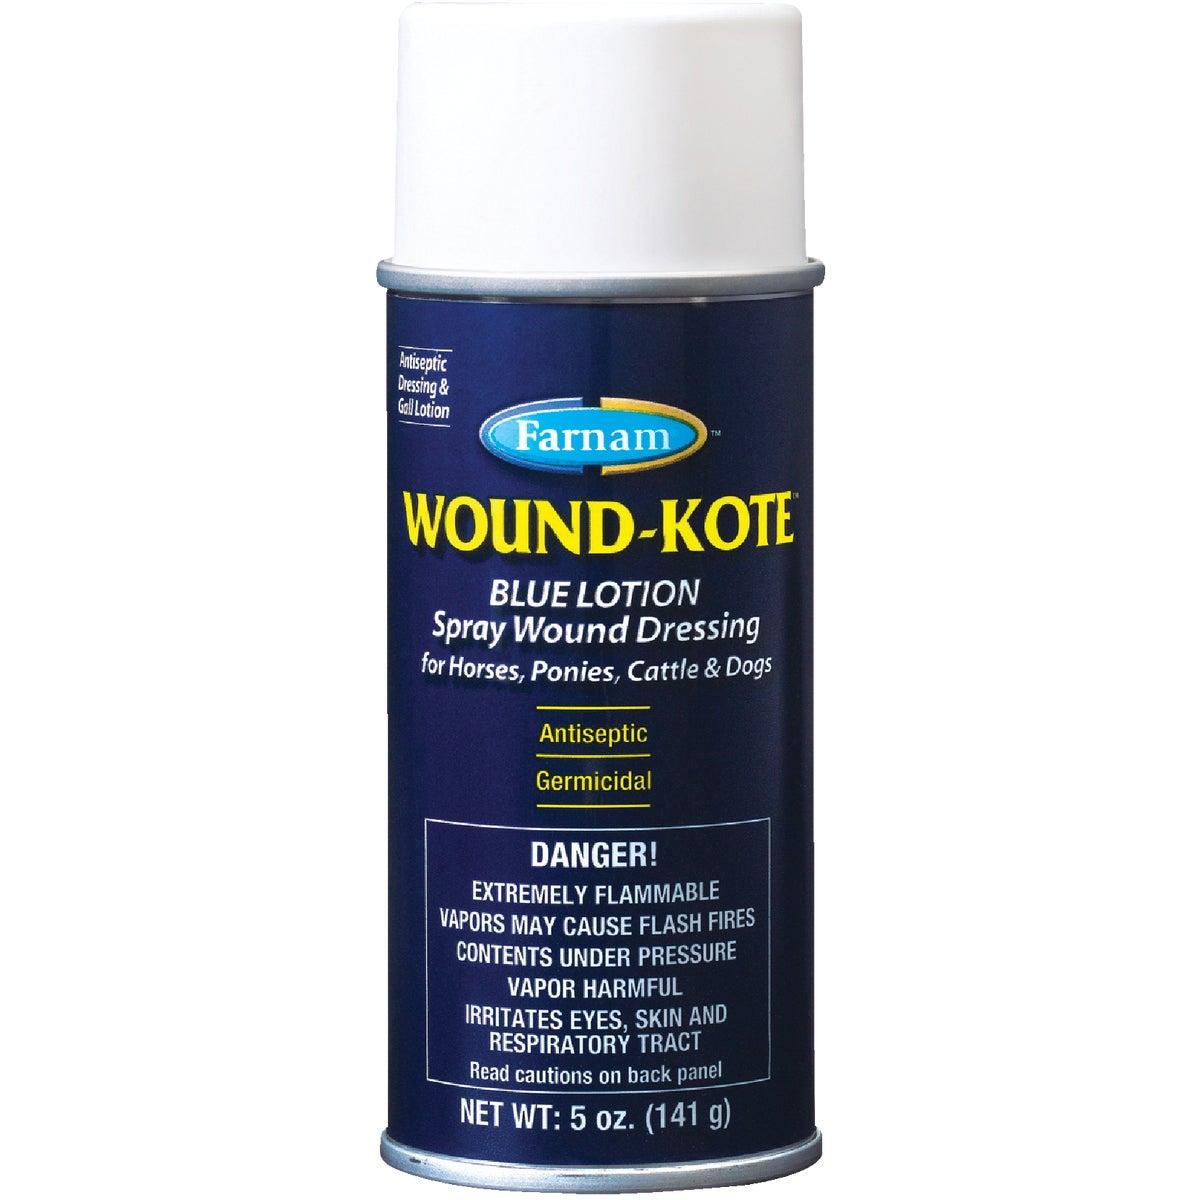 5OZ WOUND-KOTE AEROSOL